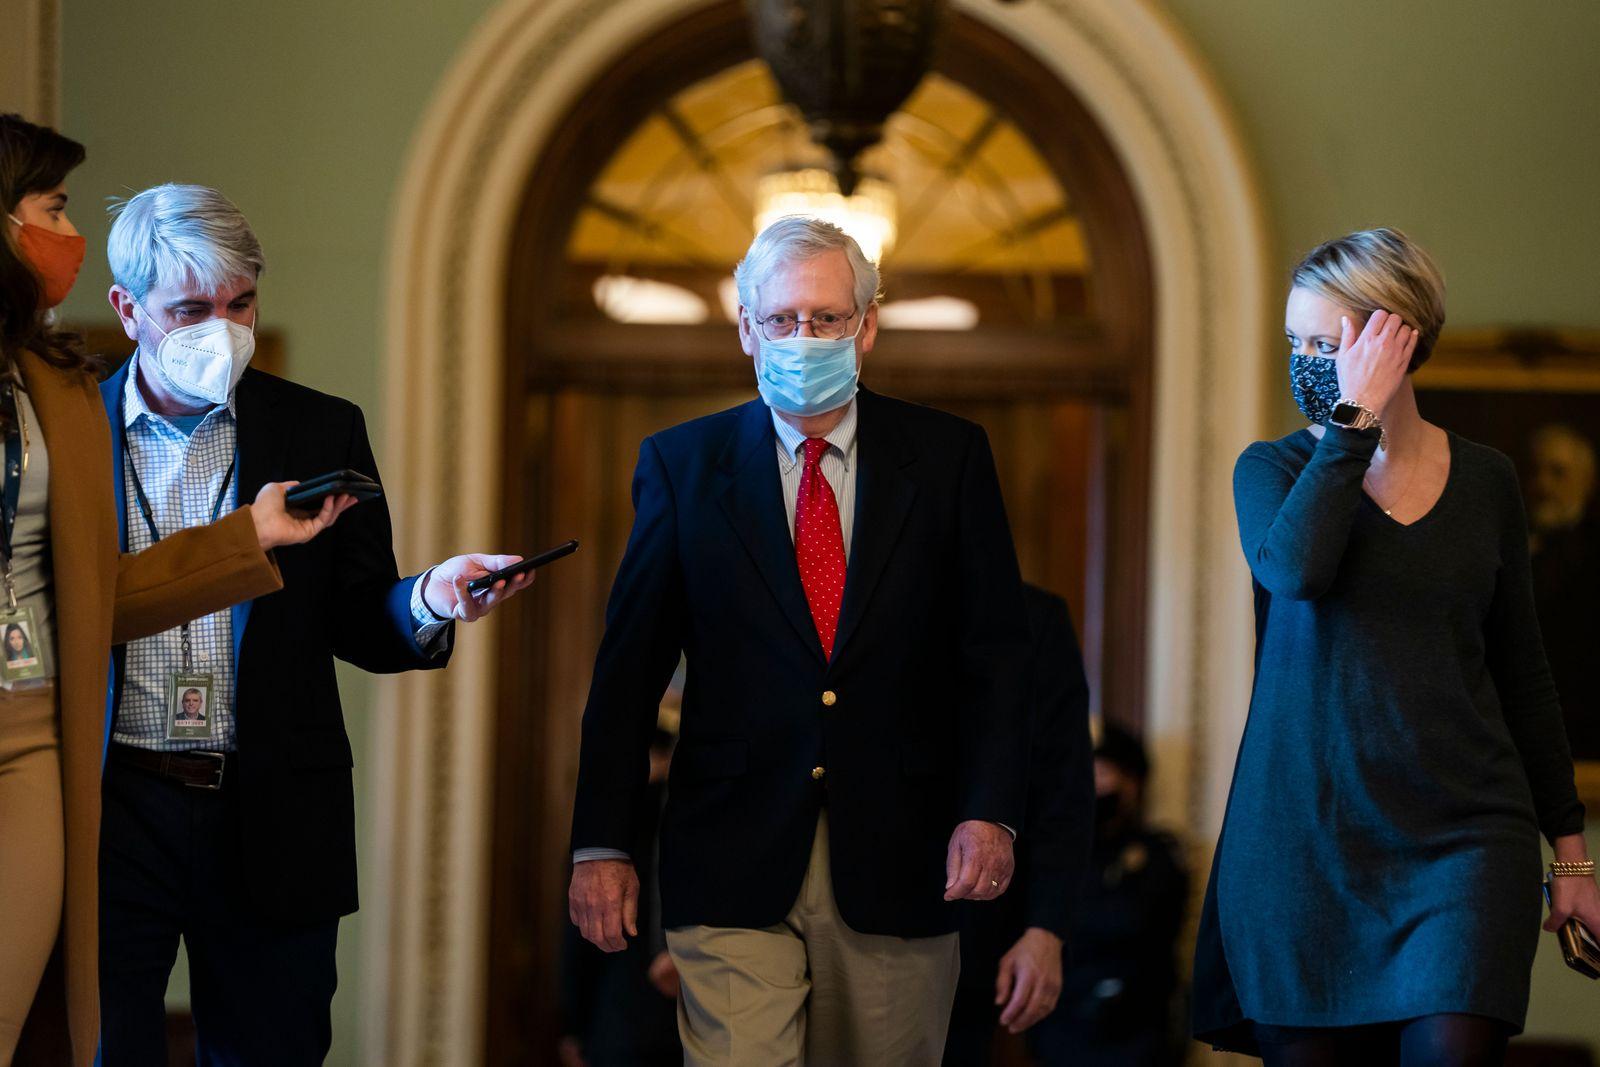 Senate passes NDDA, Washington, USA - 11 Dec 2020